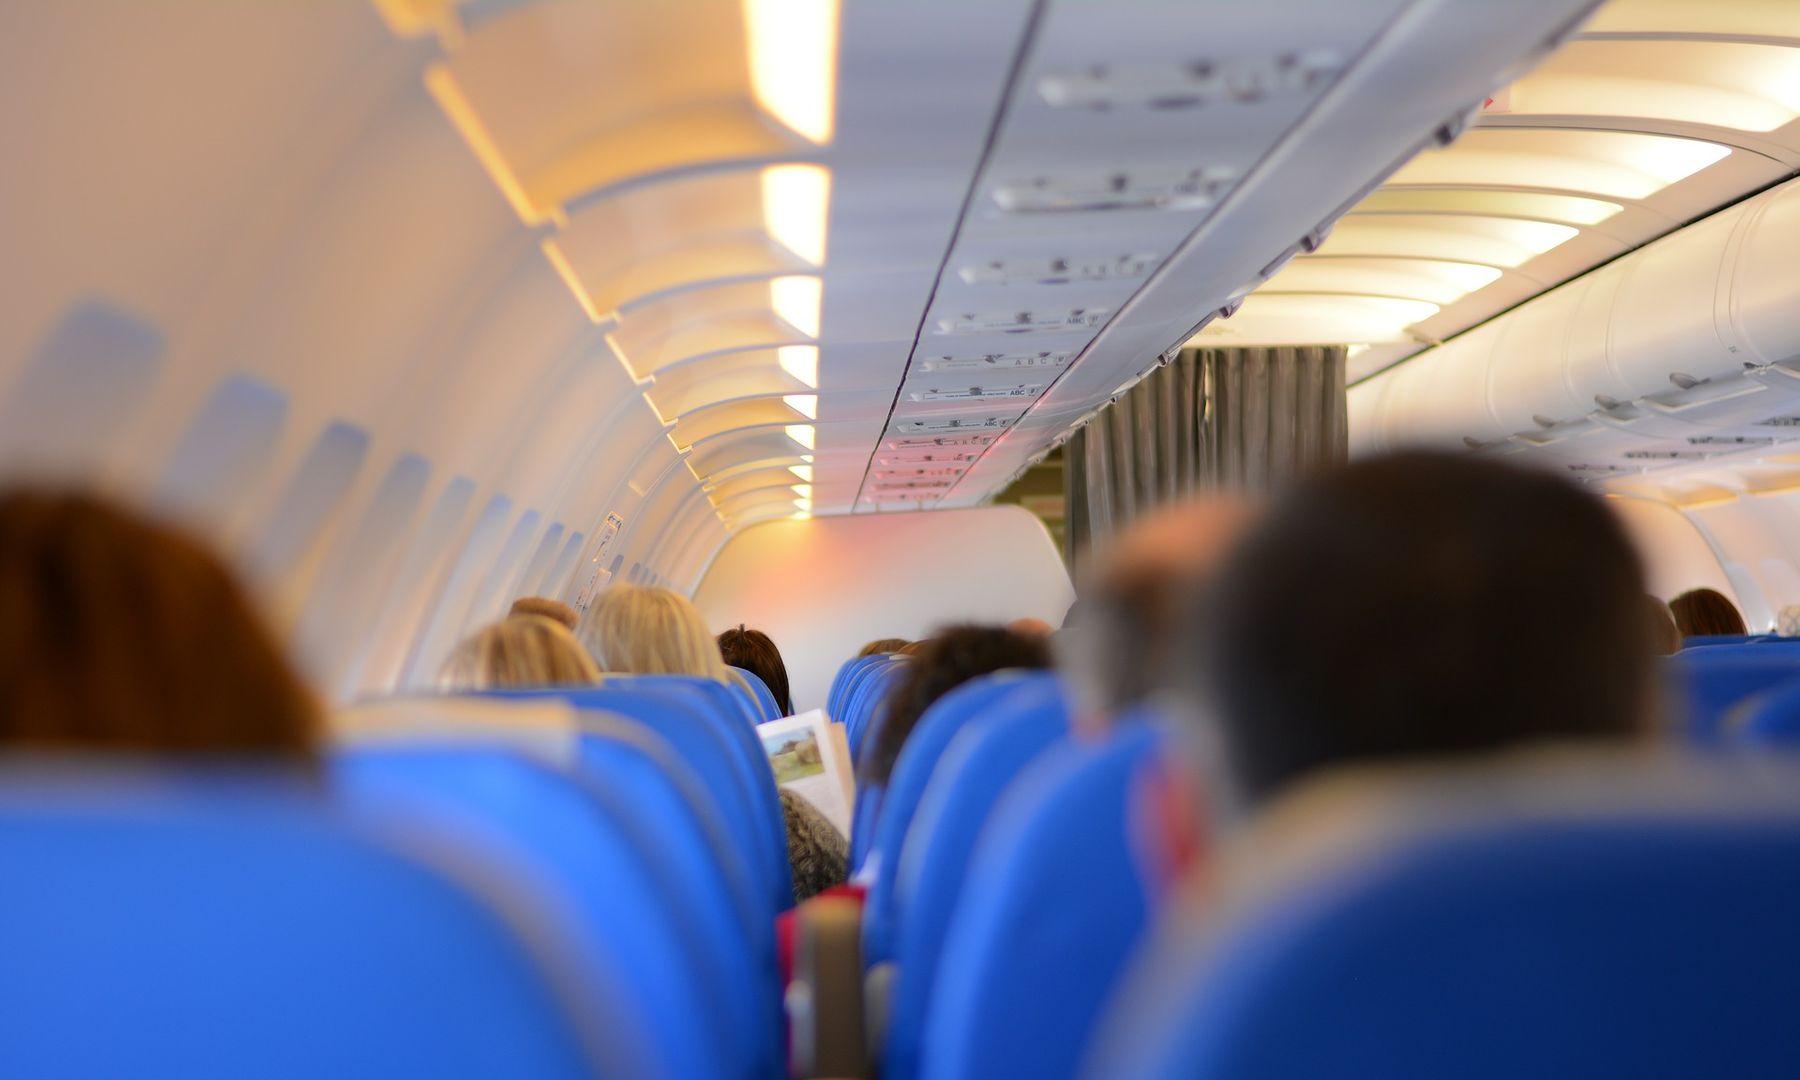 Reiseübelkeit Flugzeug